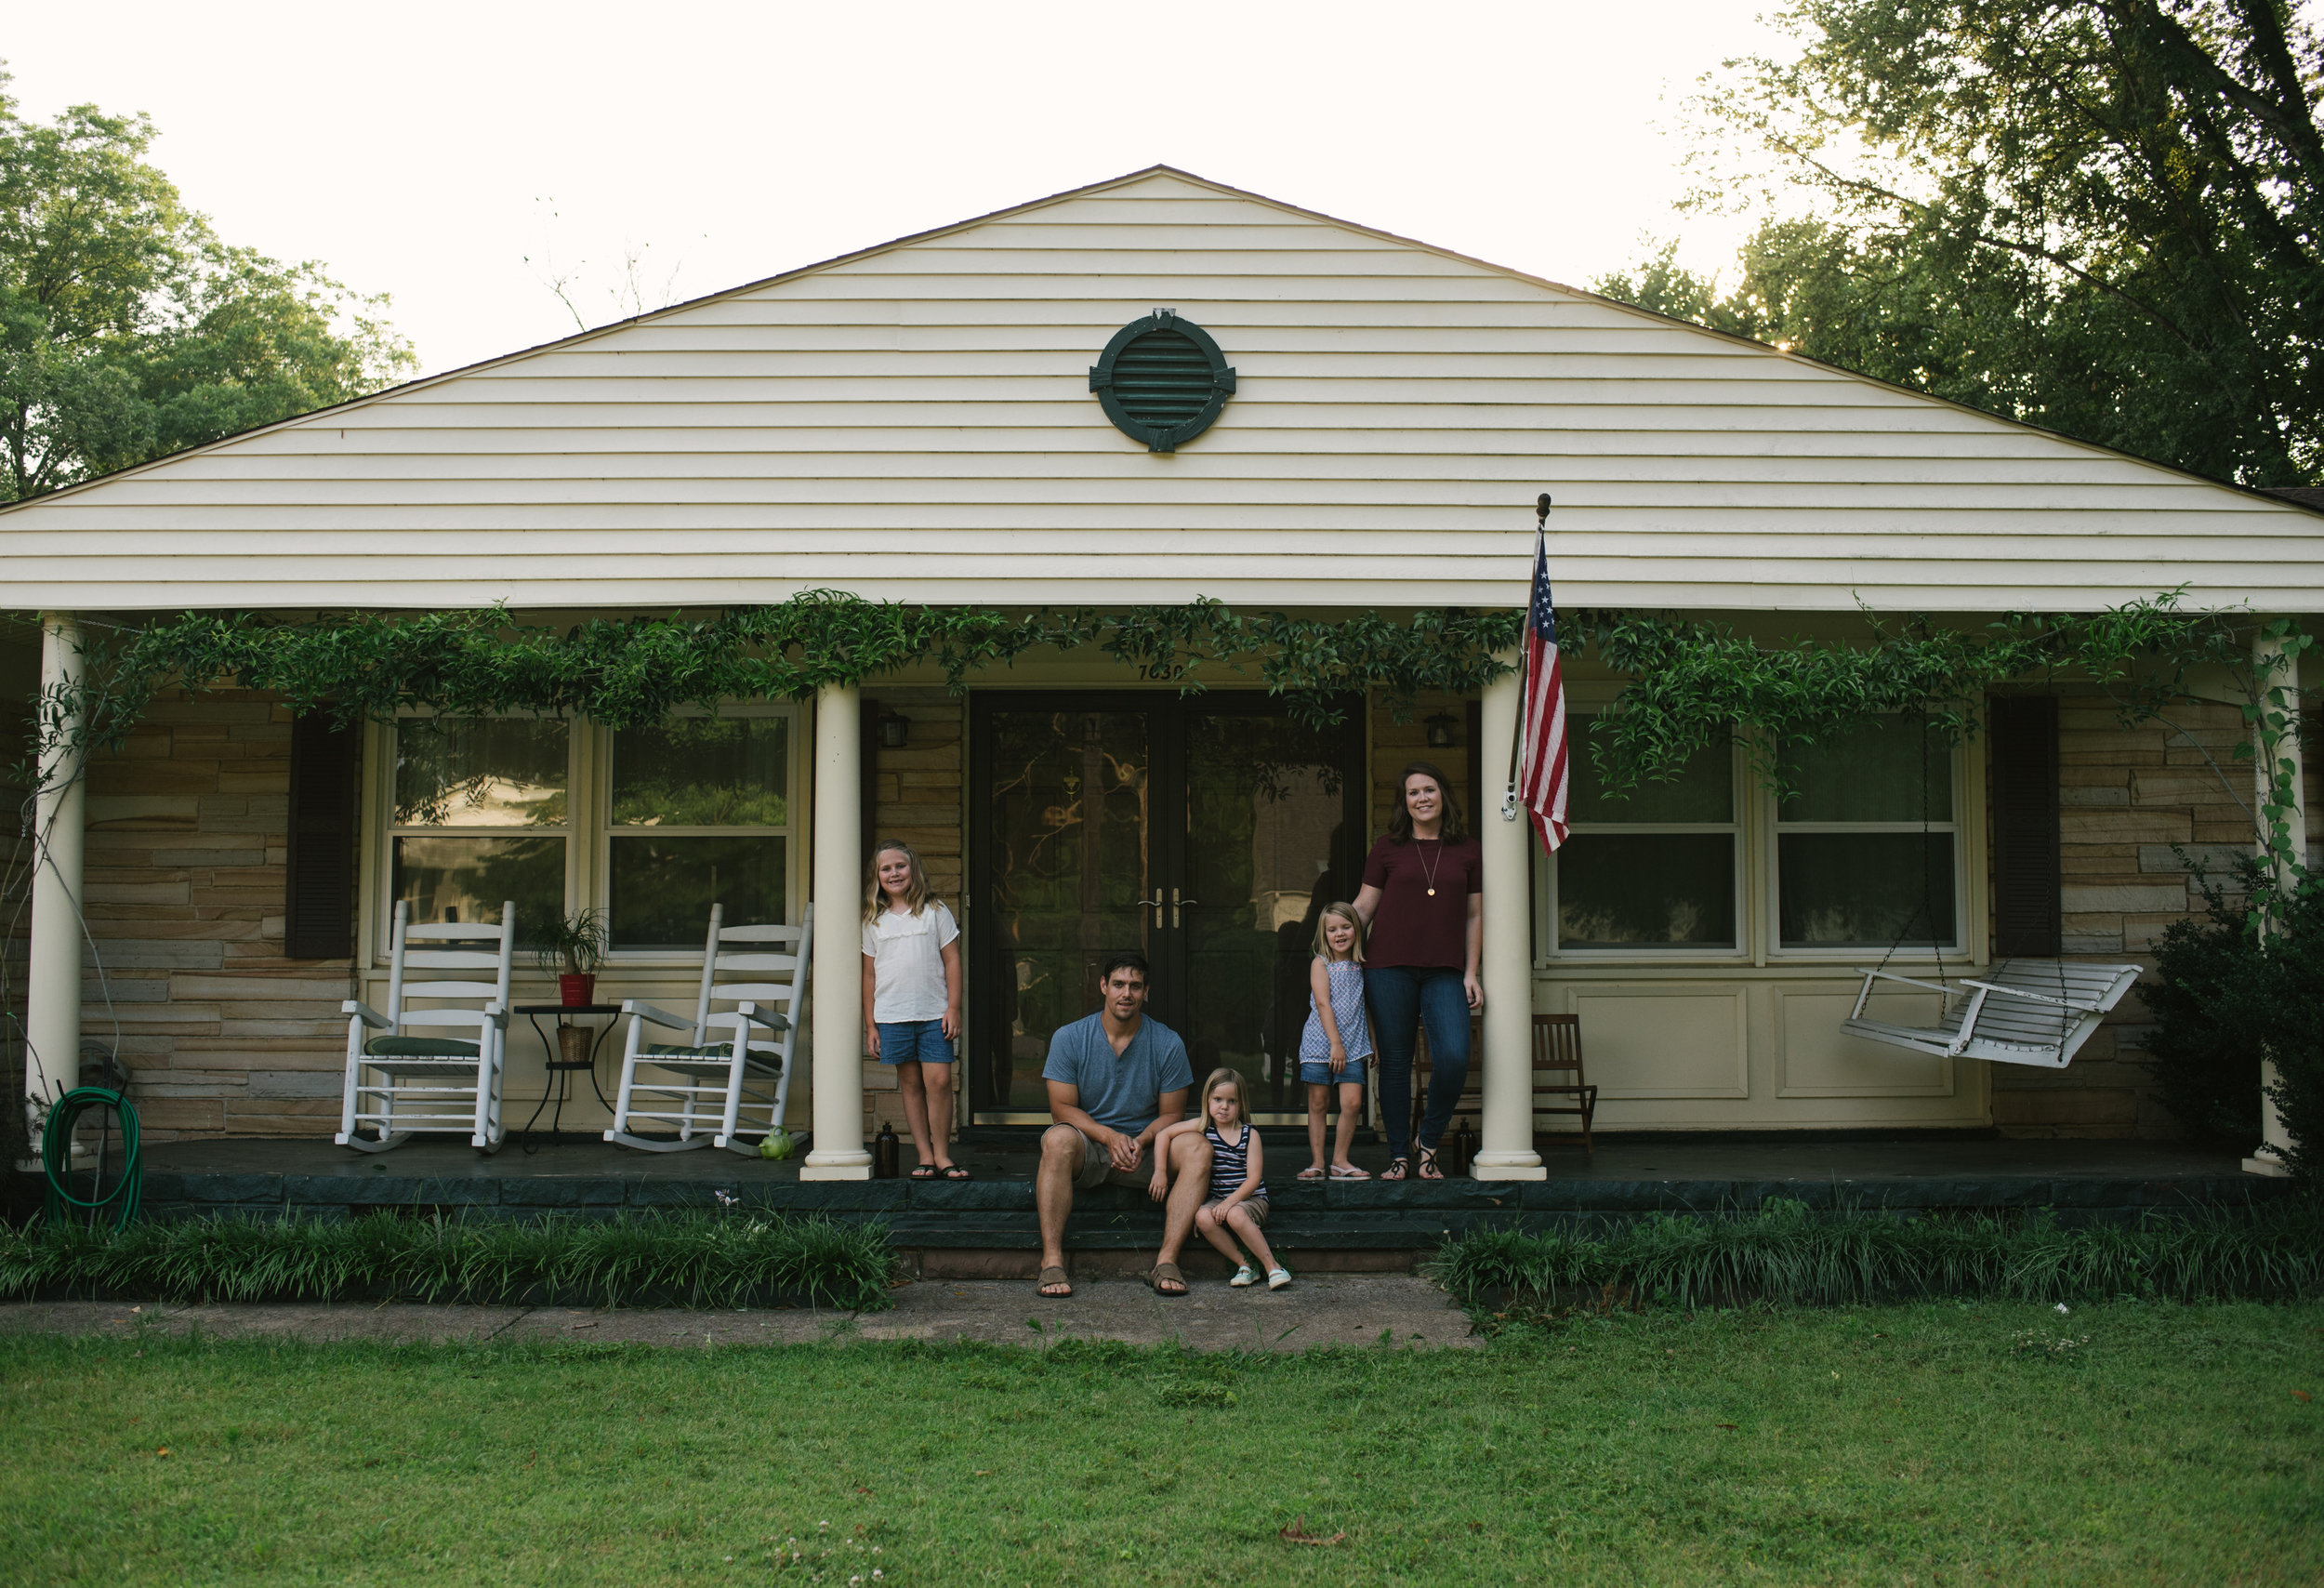 Mae Burke Motherhood Photographer Family Session at Home in Alabama-18.JPG